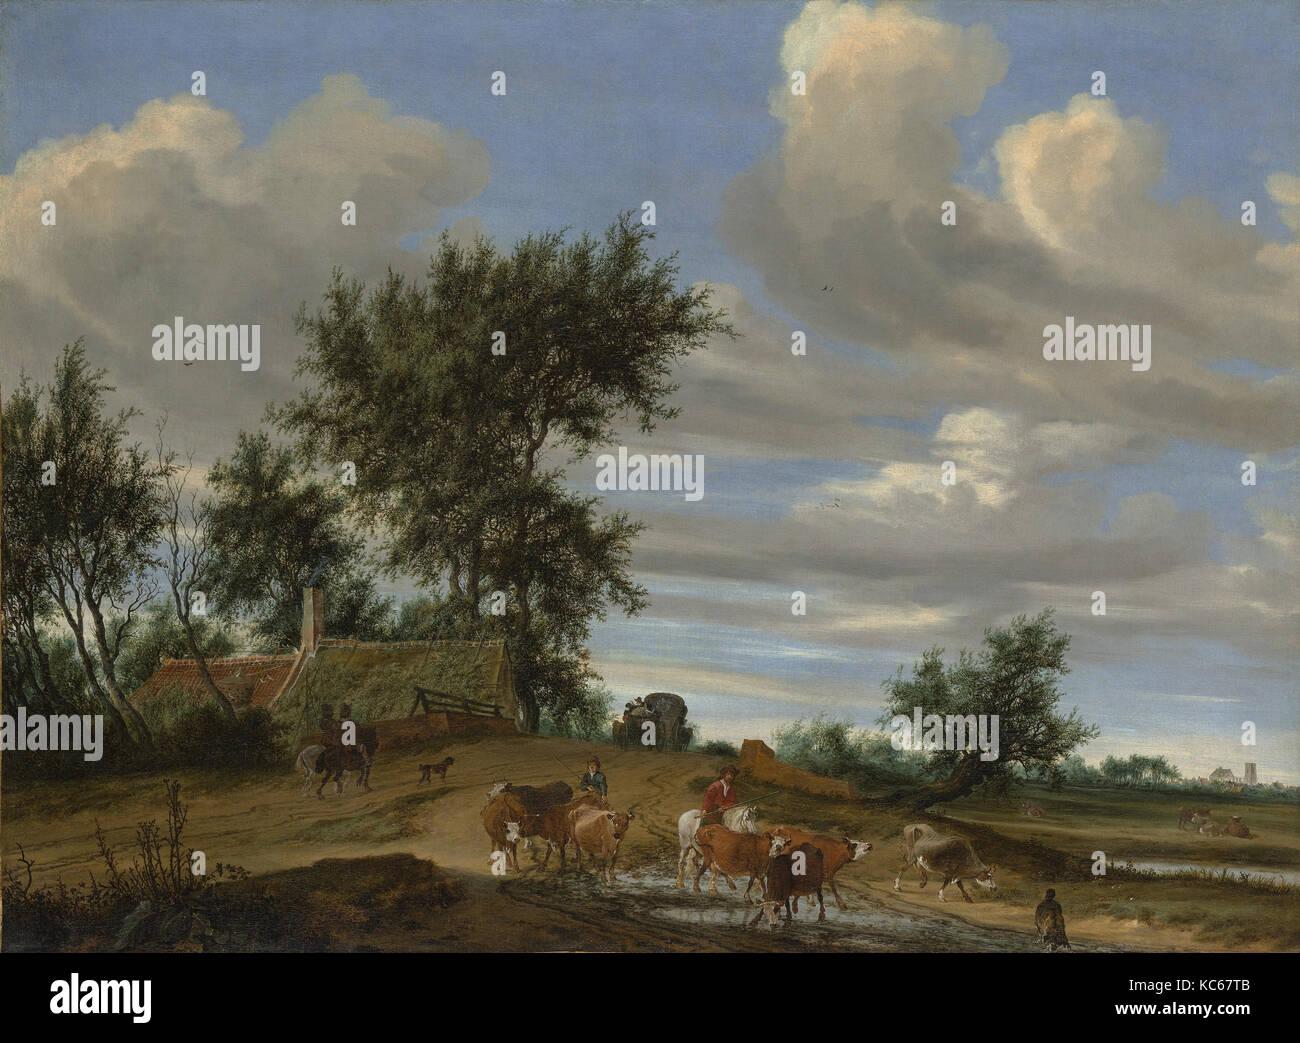 A Country Road, 1648, Oil on canvas, 38 7/8 x 52 7/8 in. (98.7 x 134.3 cm), Paintings, Salomon van Ruysdael (Dutch, Stock Photo